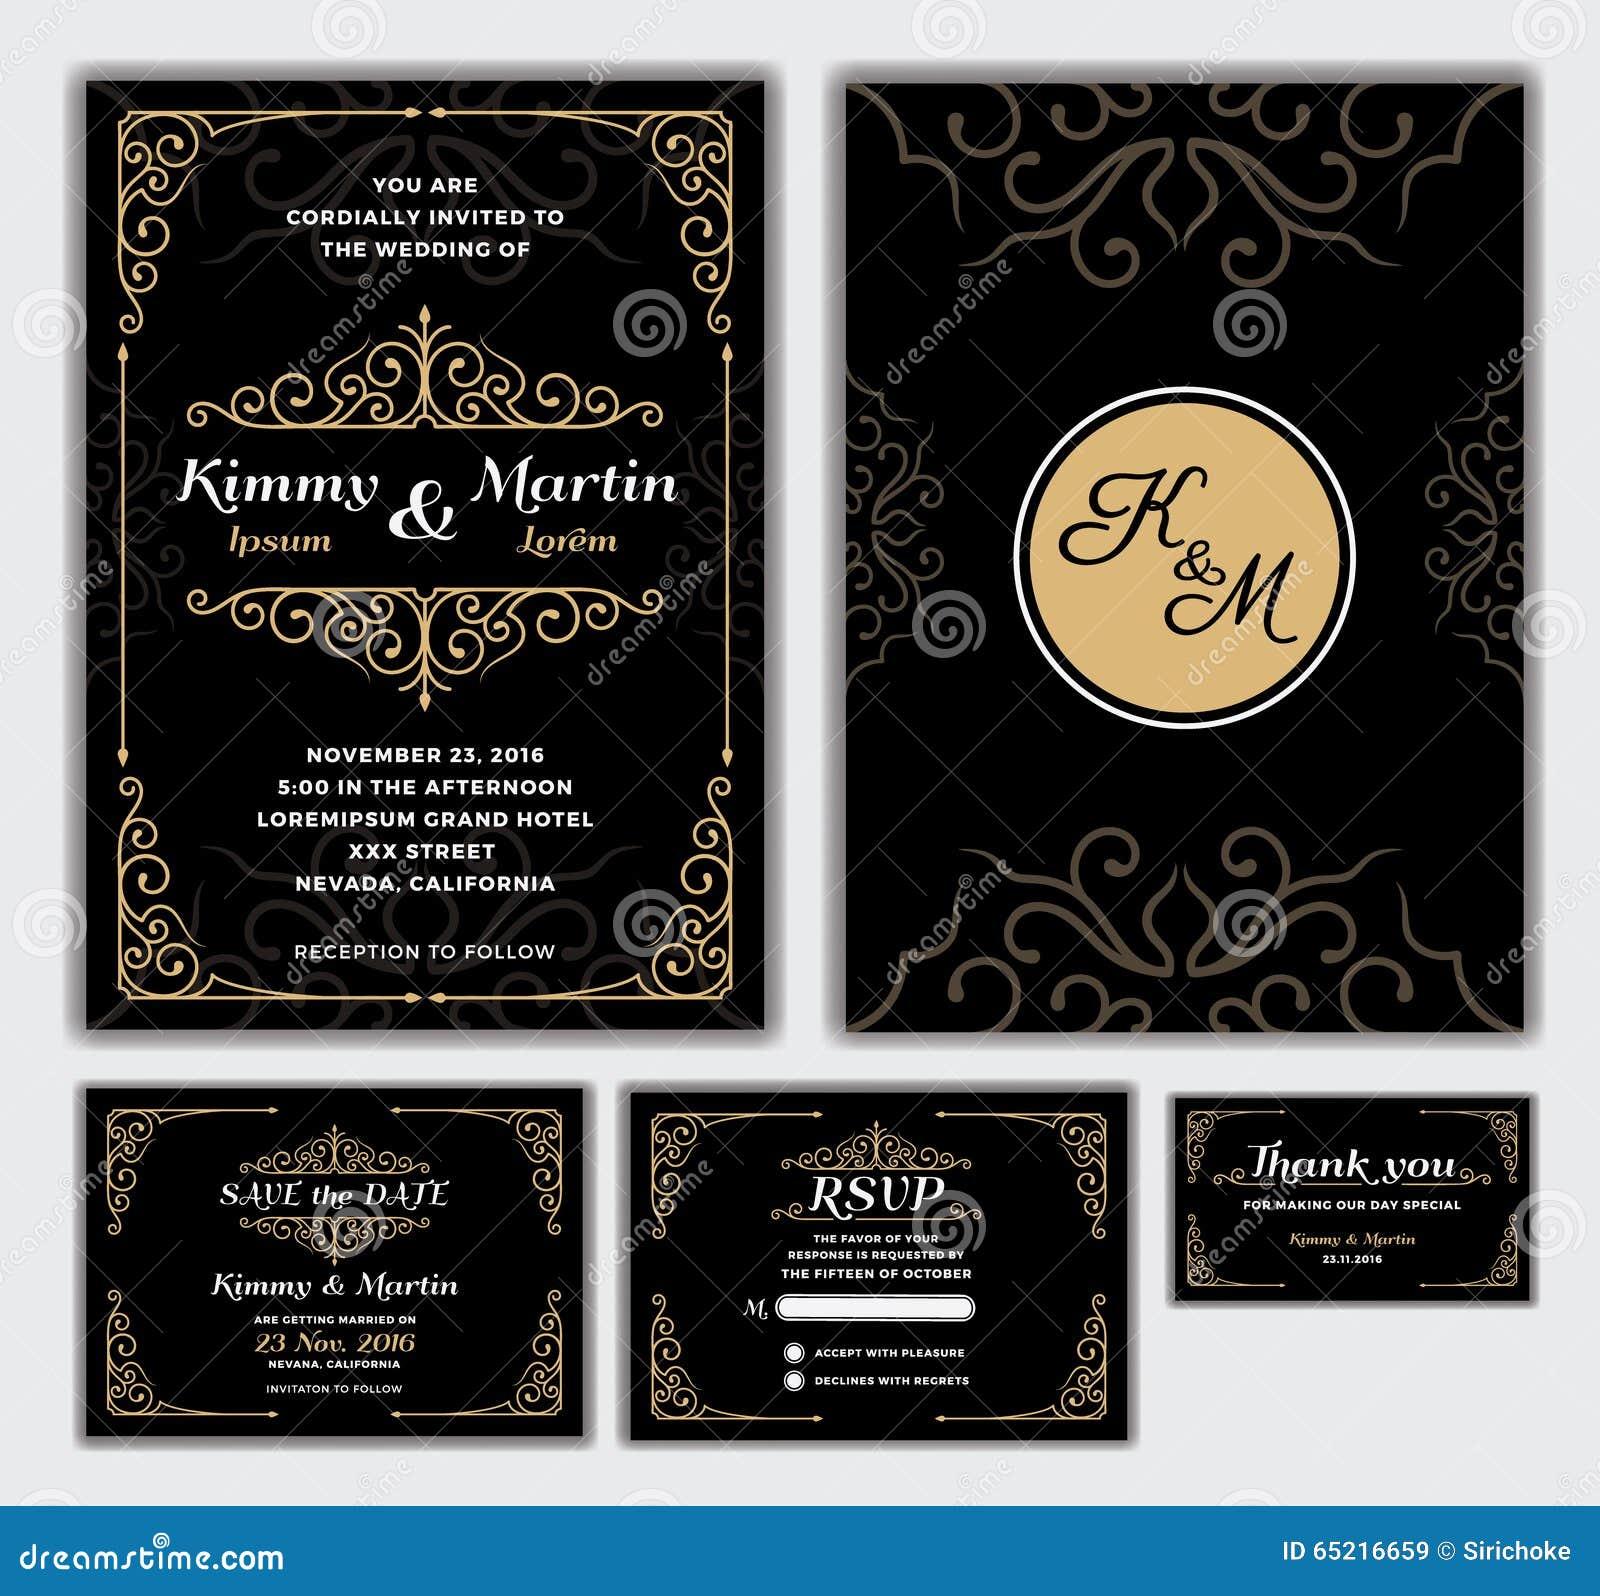 wedding invitations design templates